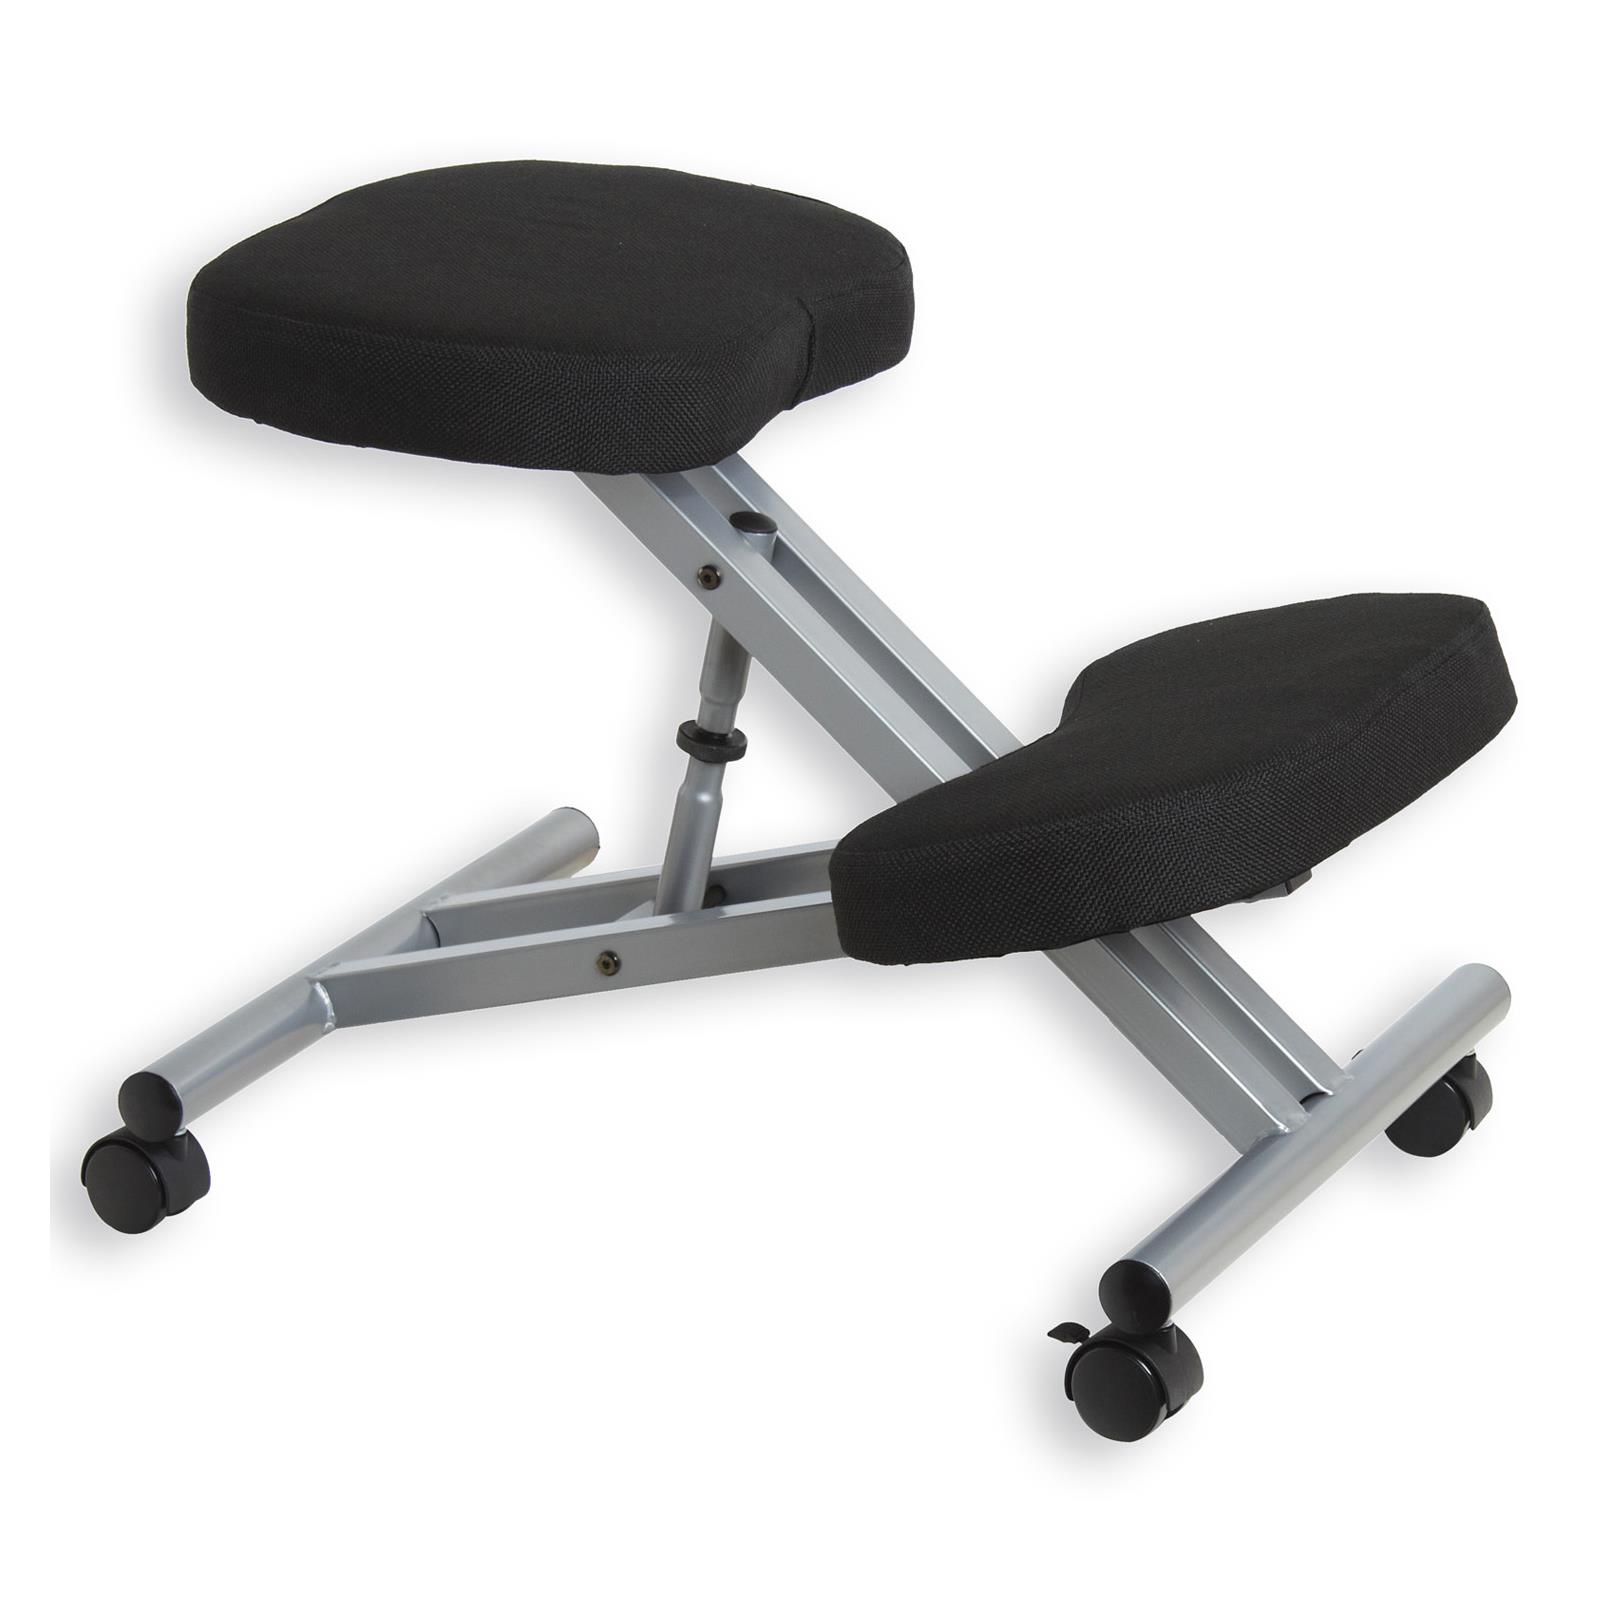 Bürohocker ergonomisch  Kniestuhl Kniehocker Sitzhocker Bürohocker Stoff ergonomisch ...